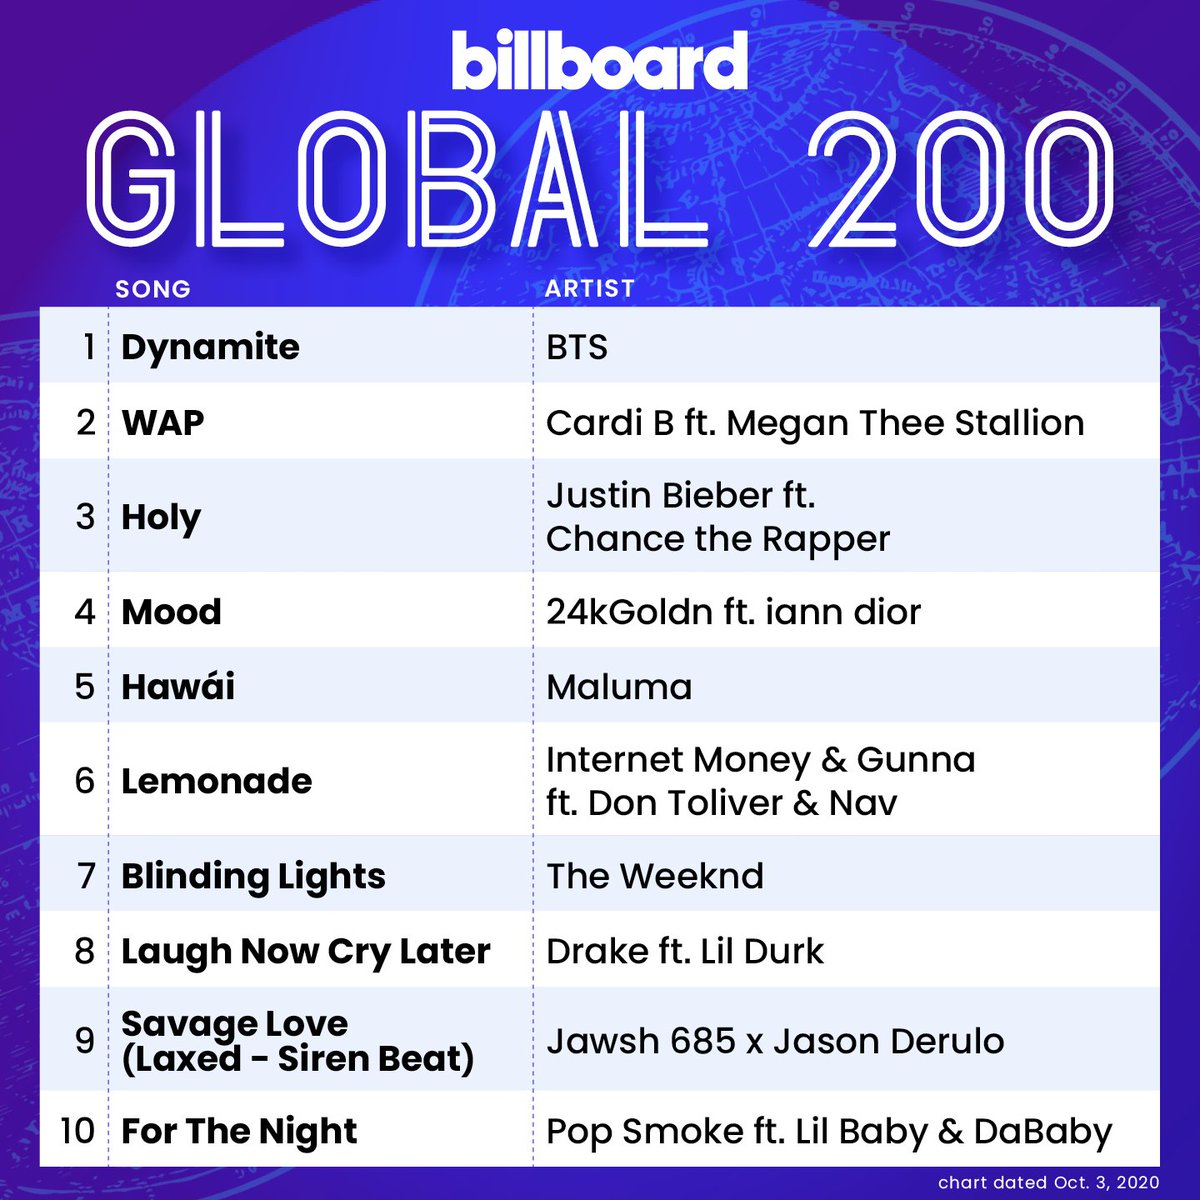 [INFO]  @BTS_twt se convirtió ahora en el primer artista en lograr múltiples número 1 en la lista Global 200 de Billboard con 'Savage Love (BTS Remix)' y 'Dynamite'.  #BTS #방탄소년단 #ARMY #JIMINMéxico © Via. Charts_k  𝒥𝒫𝒶ℴ🍑 https://t.co/AKjAXho2Nr